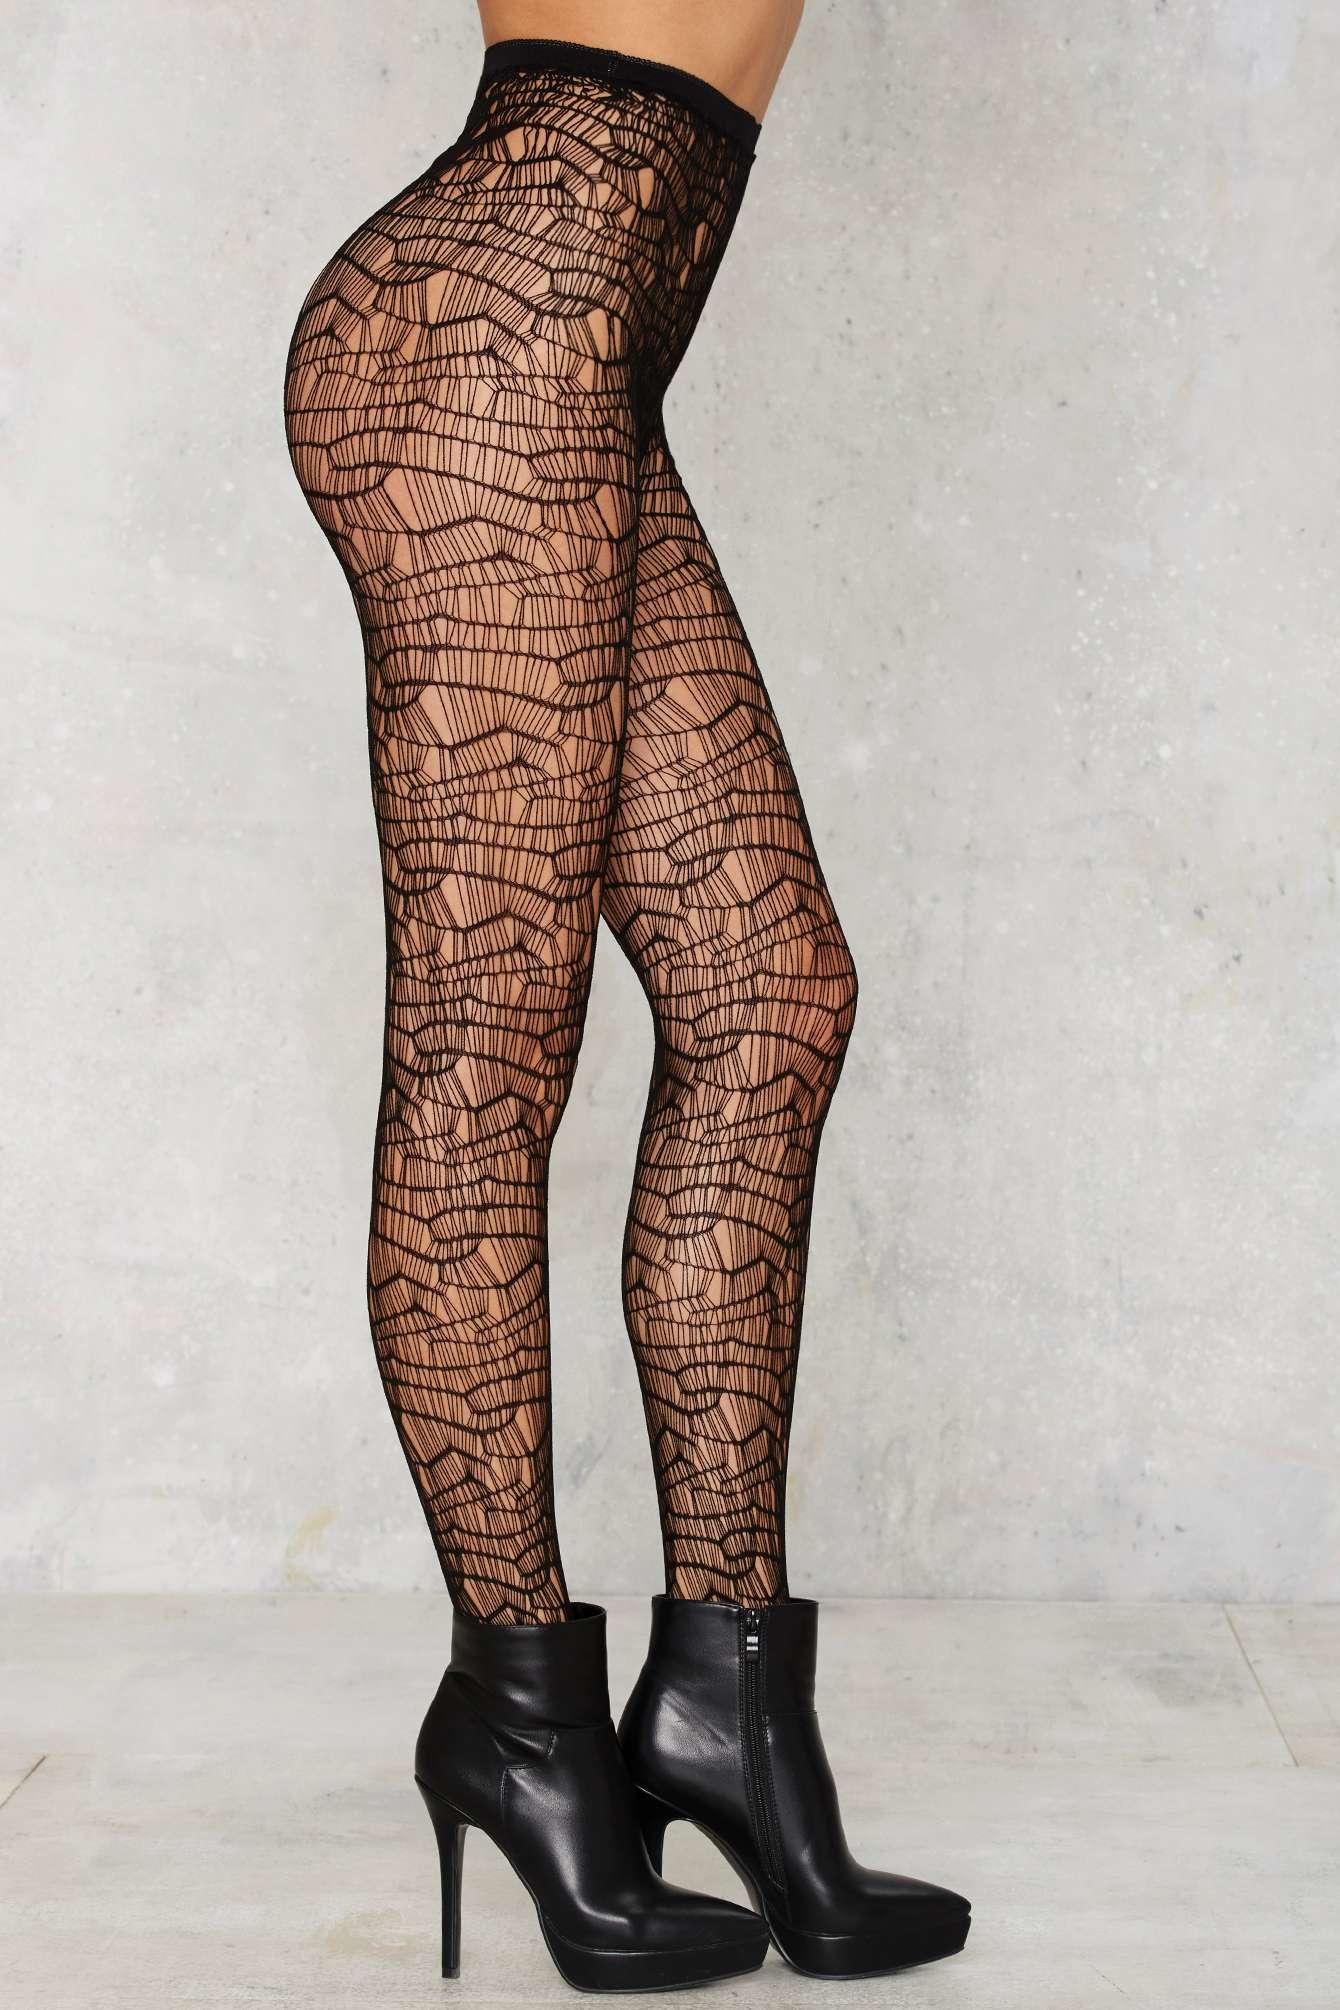 7f1b1da8a Nasty Gal Look From London Rihanna Fishnet Tights in Black - Lyst